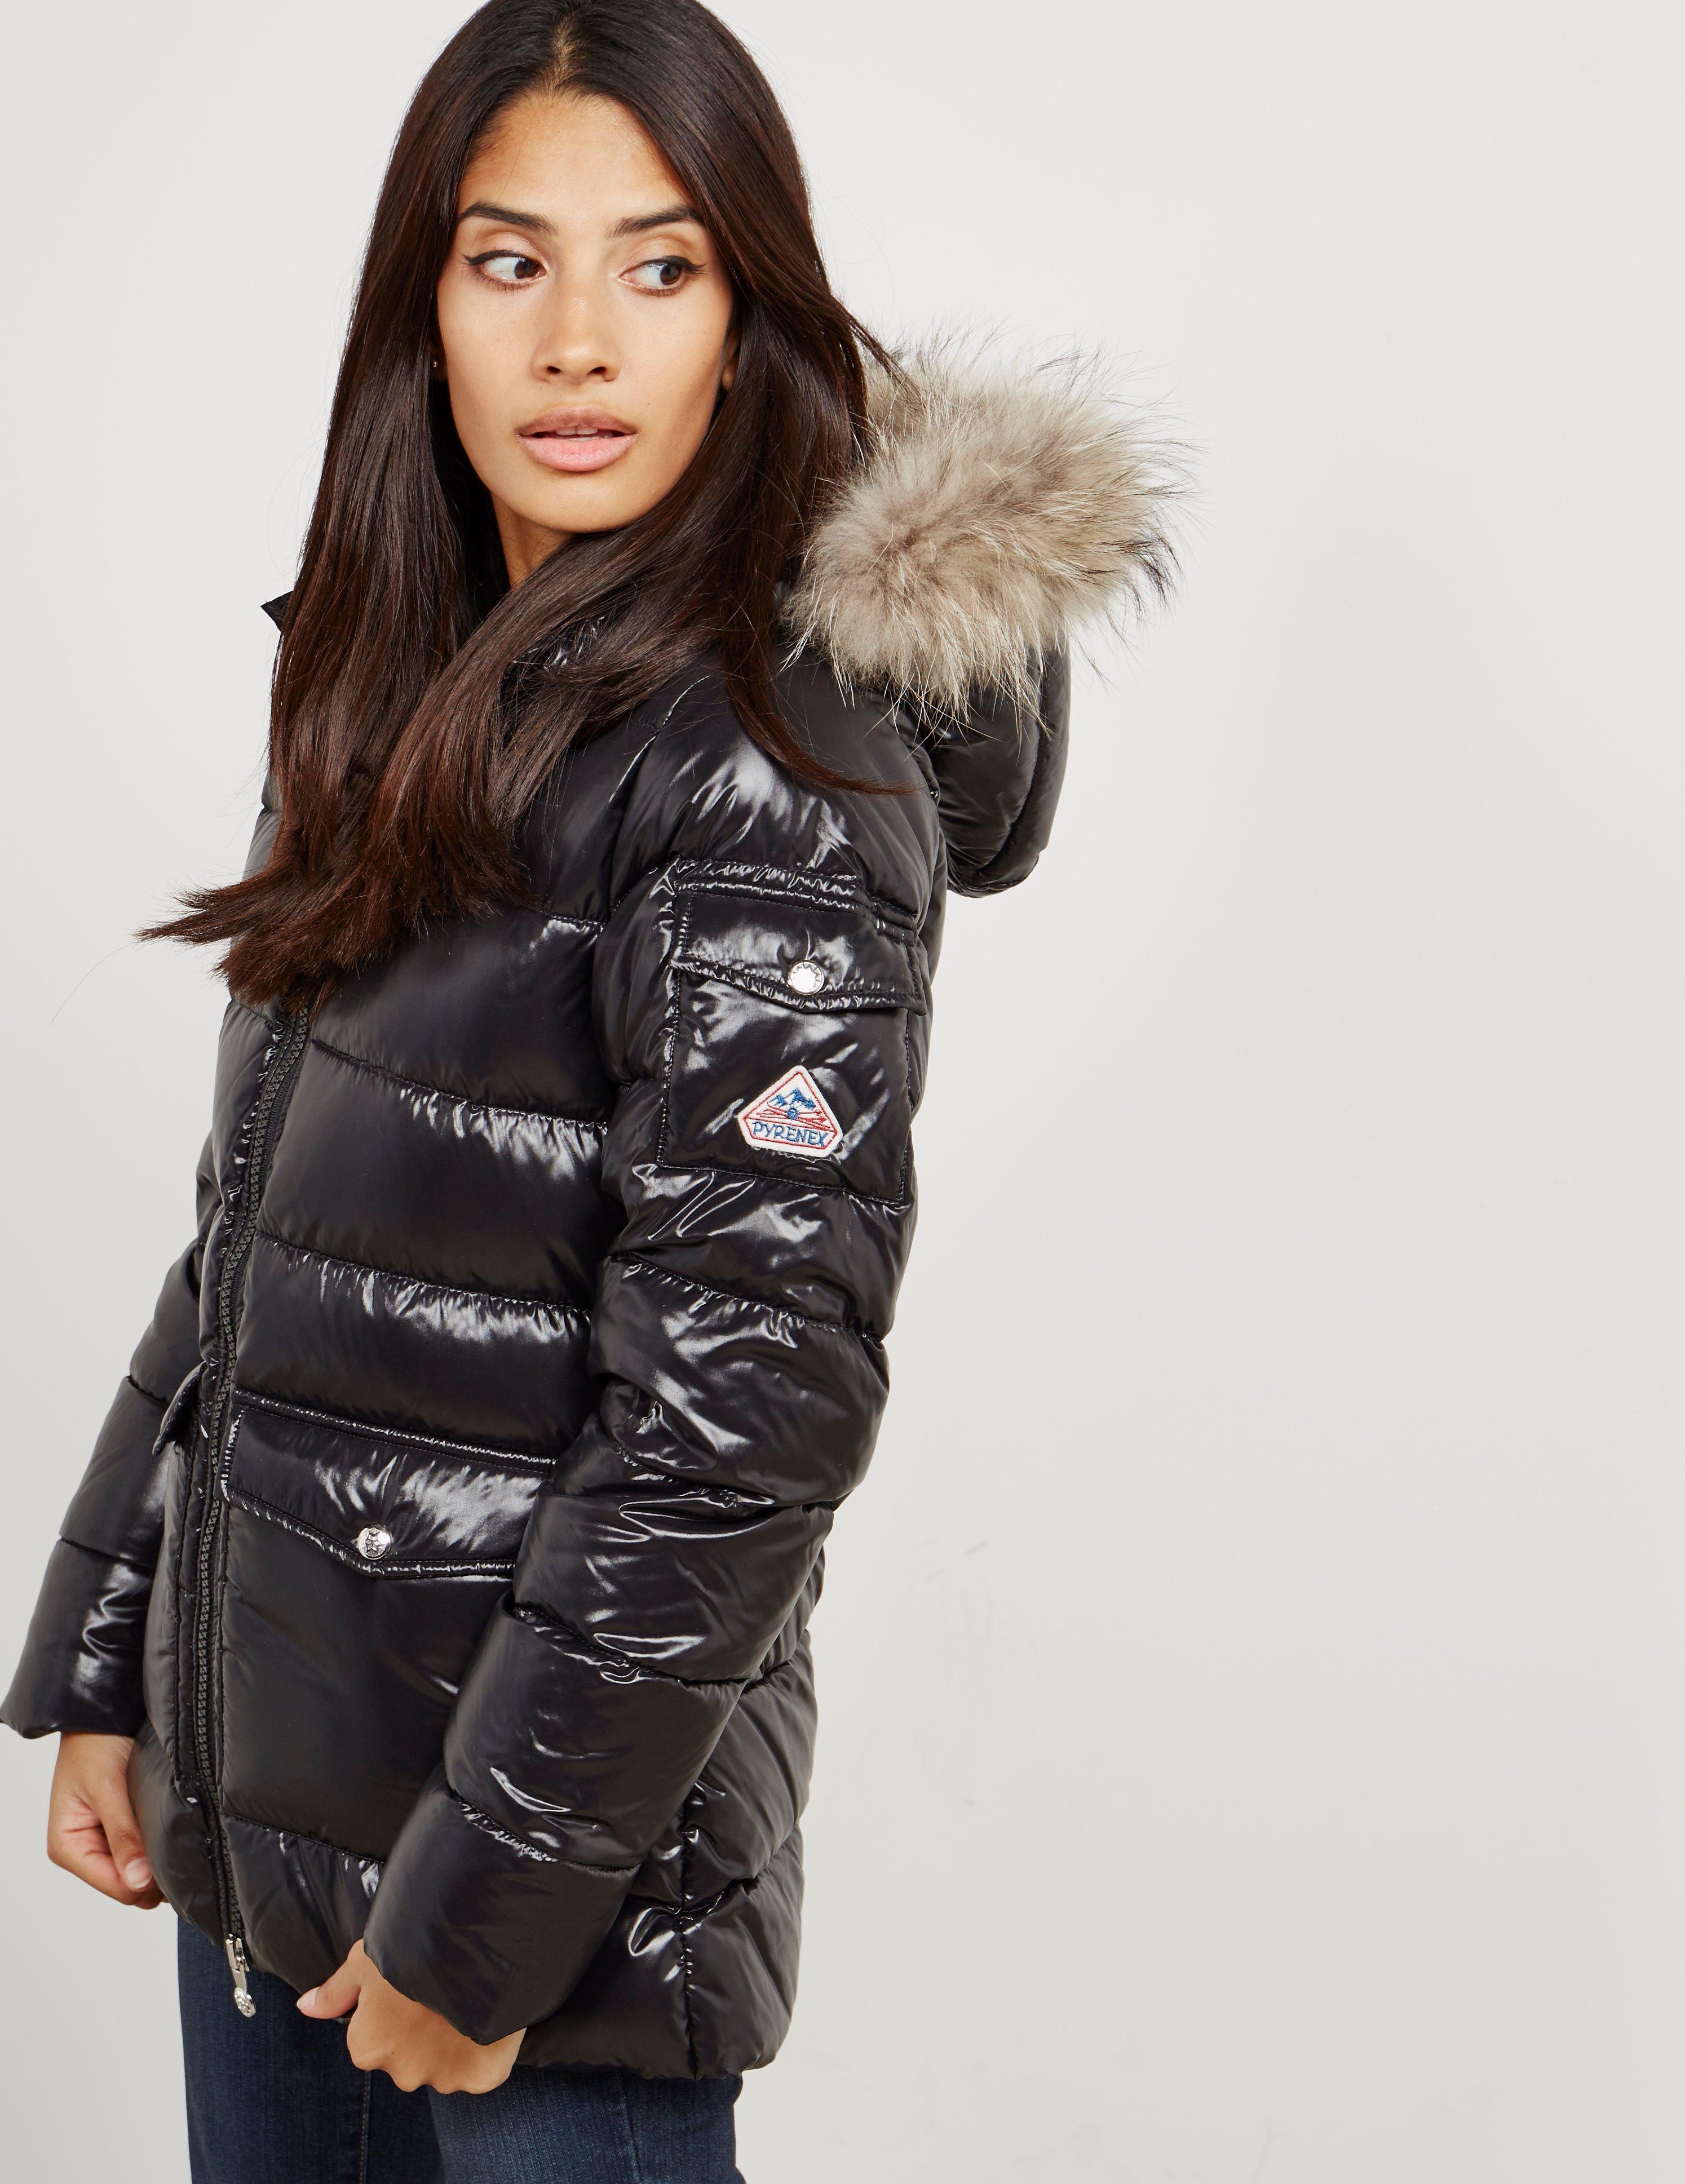 23390782680 Pyrenex Womens Authentic Padded Shiny Jacket Black in Black - Lyst